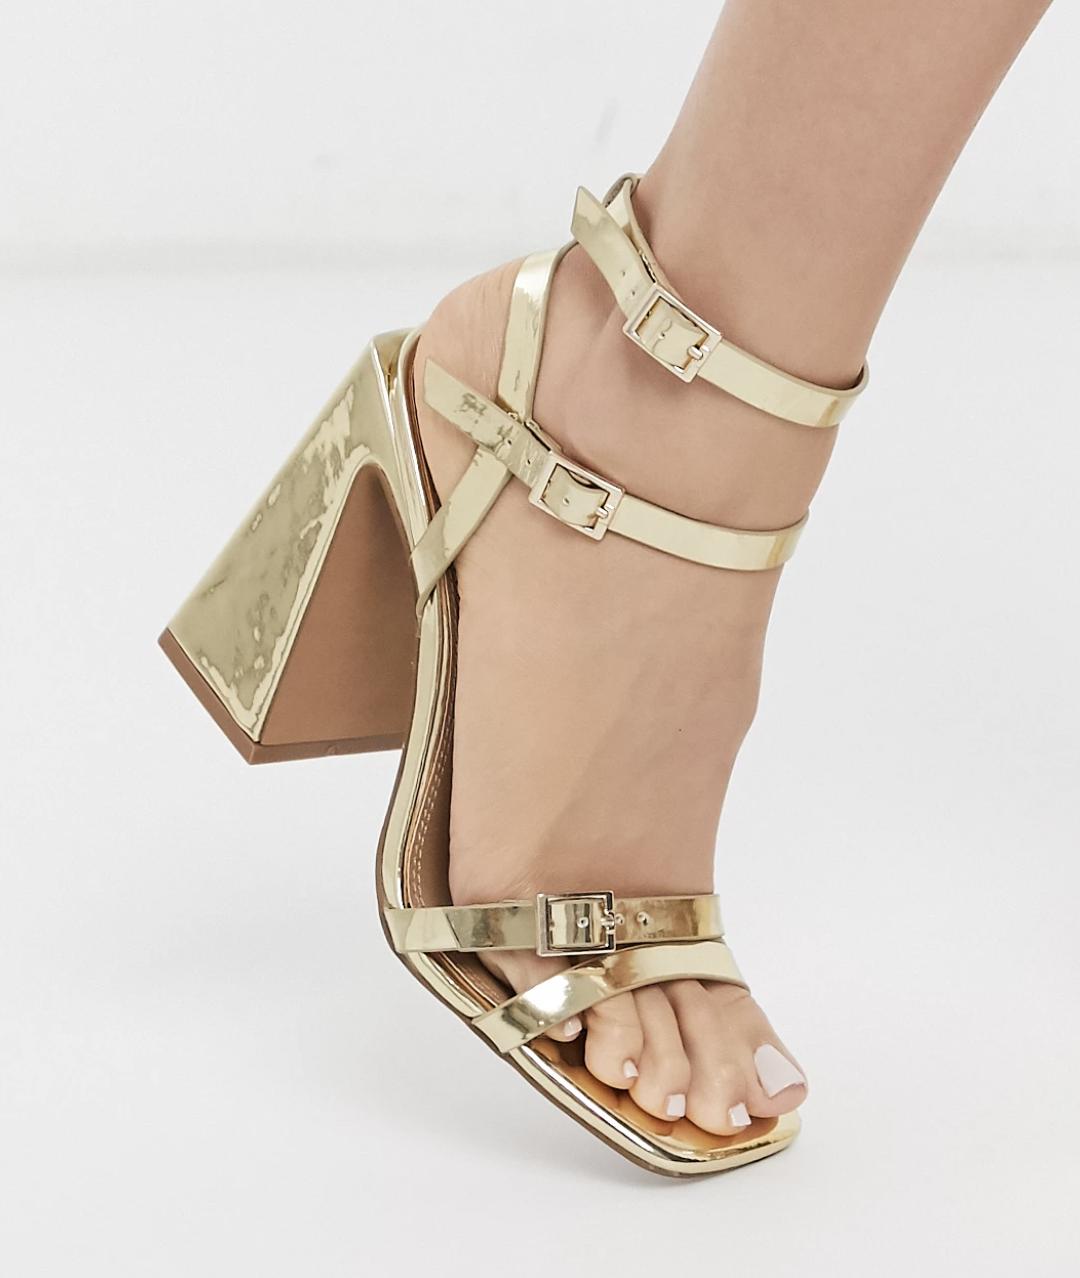 Sandalias de tacón cuadrado en dorado Nitro de ASOS DESIGN